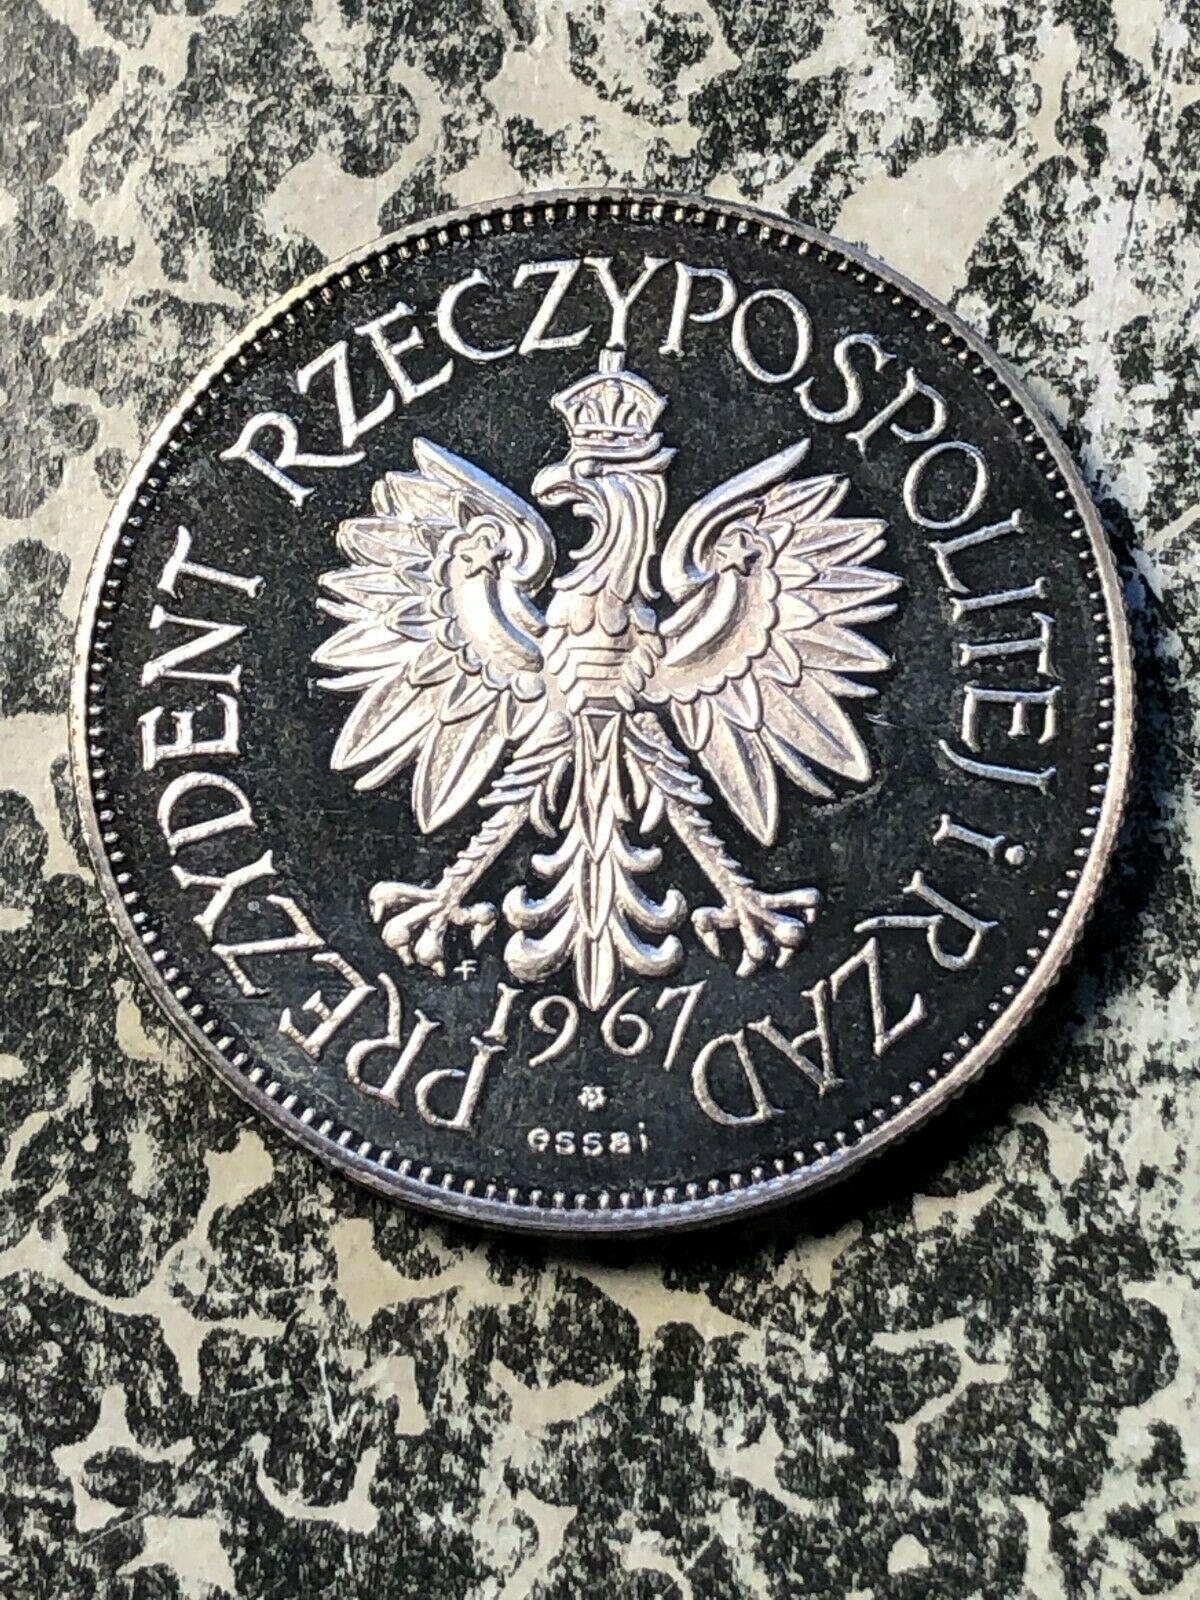 1967 Polonia Kosciuszko/Pilsudsky Moneda Medalla Lote #Jm777 de Plata ! Prueba